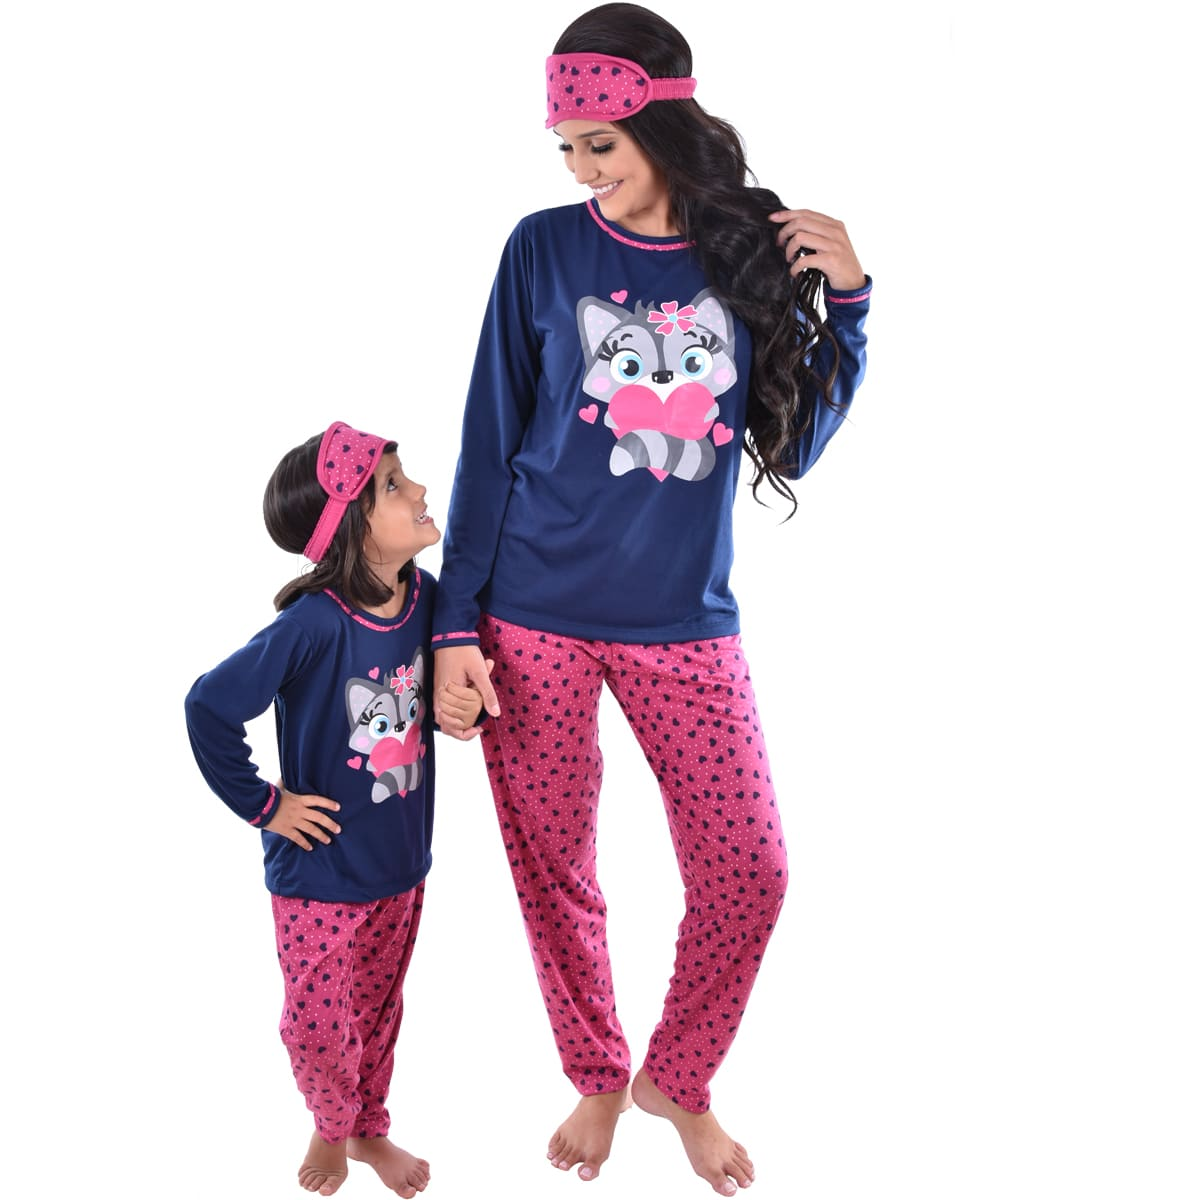 Pijama Longo Calça C/ Tapa Olho Feminino Infantil Estampa Desenho Raposa Ref: 311